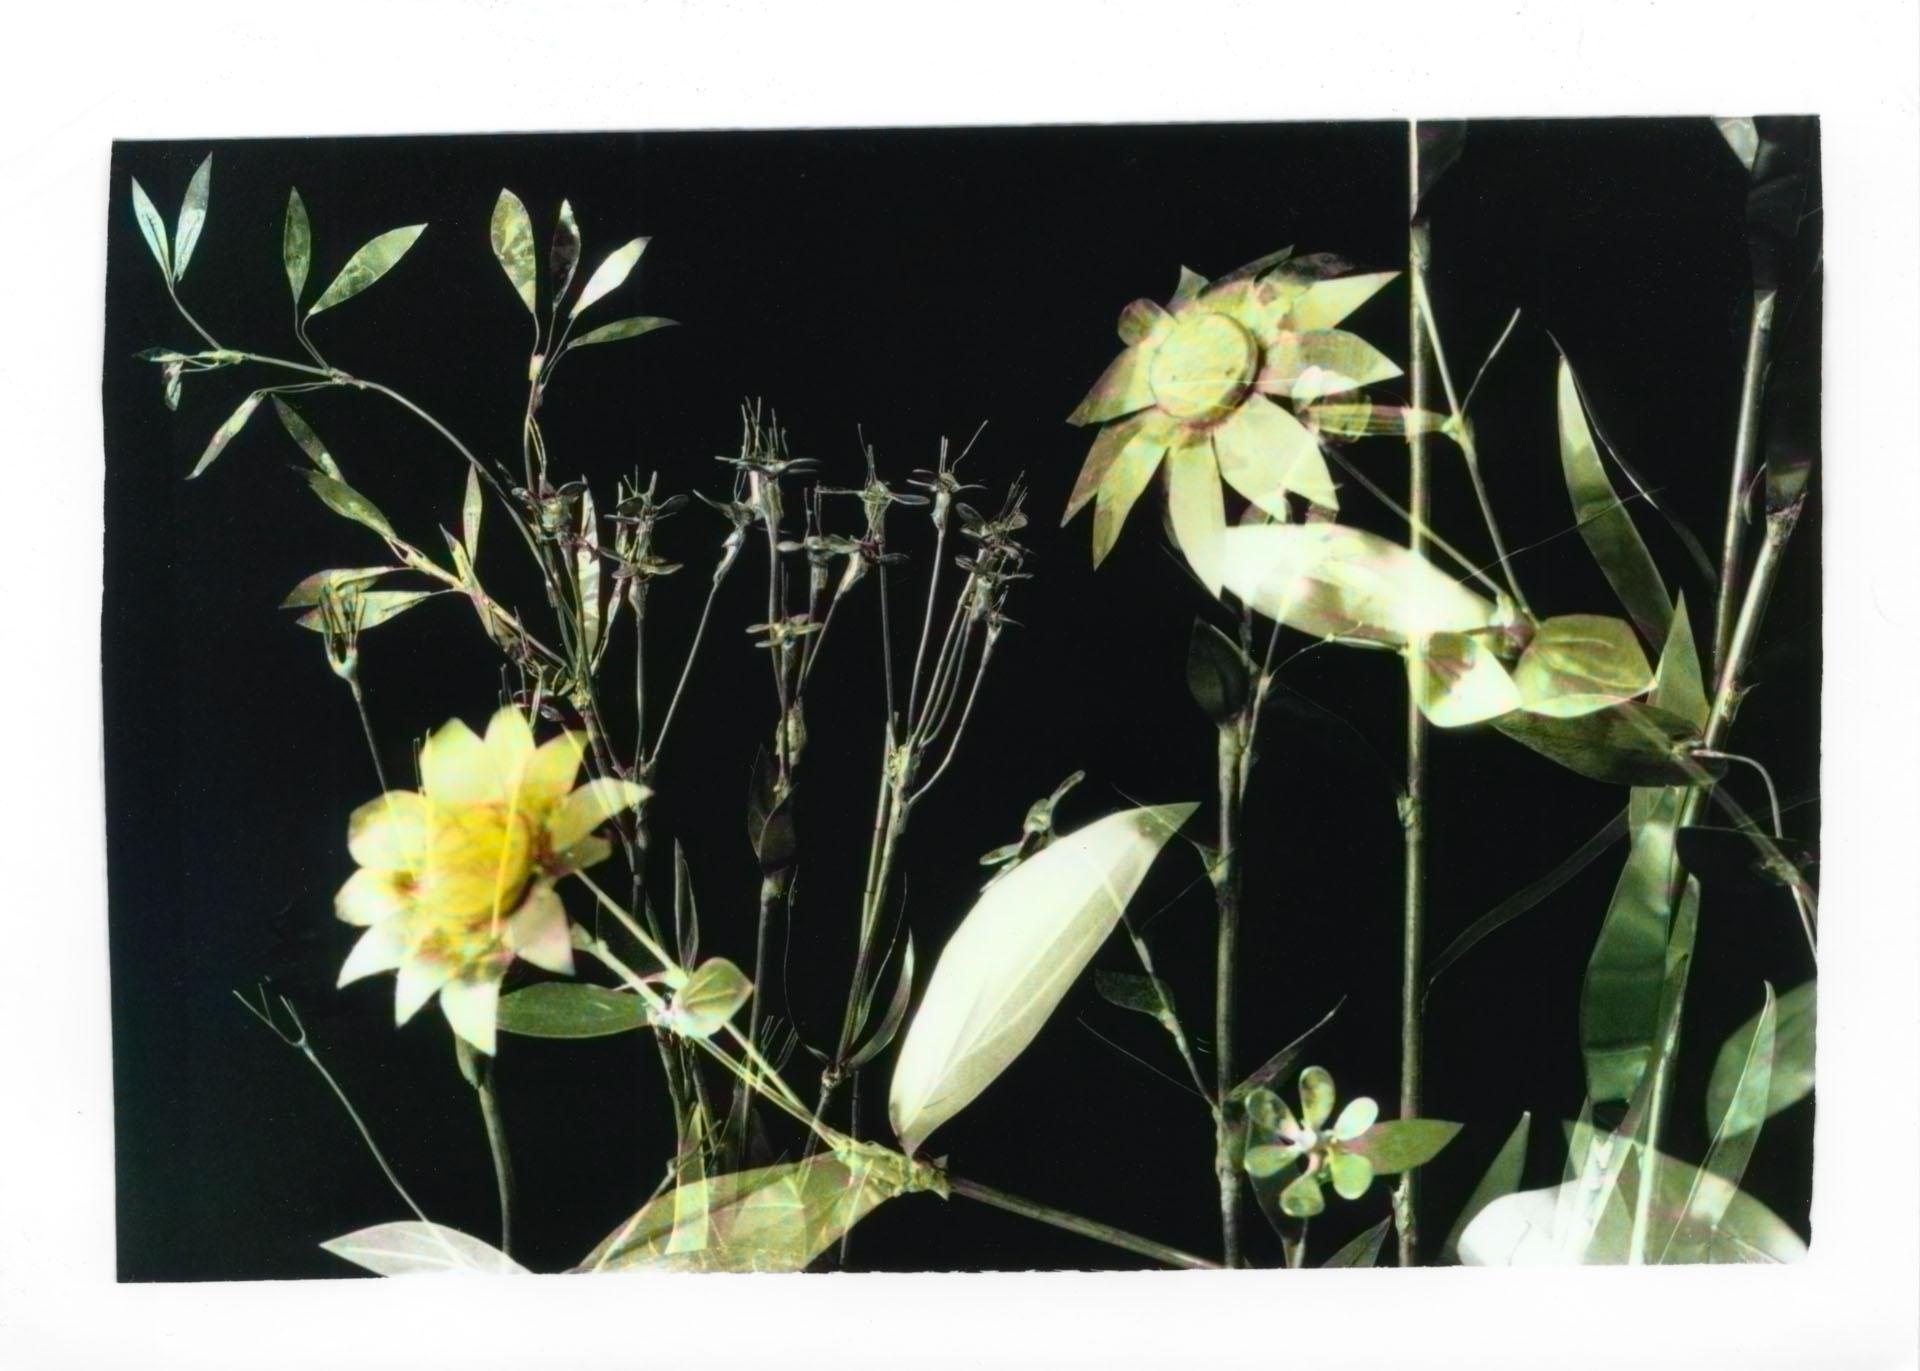 May photo of the Vivero Enredado calendar by Pieter Dedoncker and Jose Montealegre